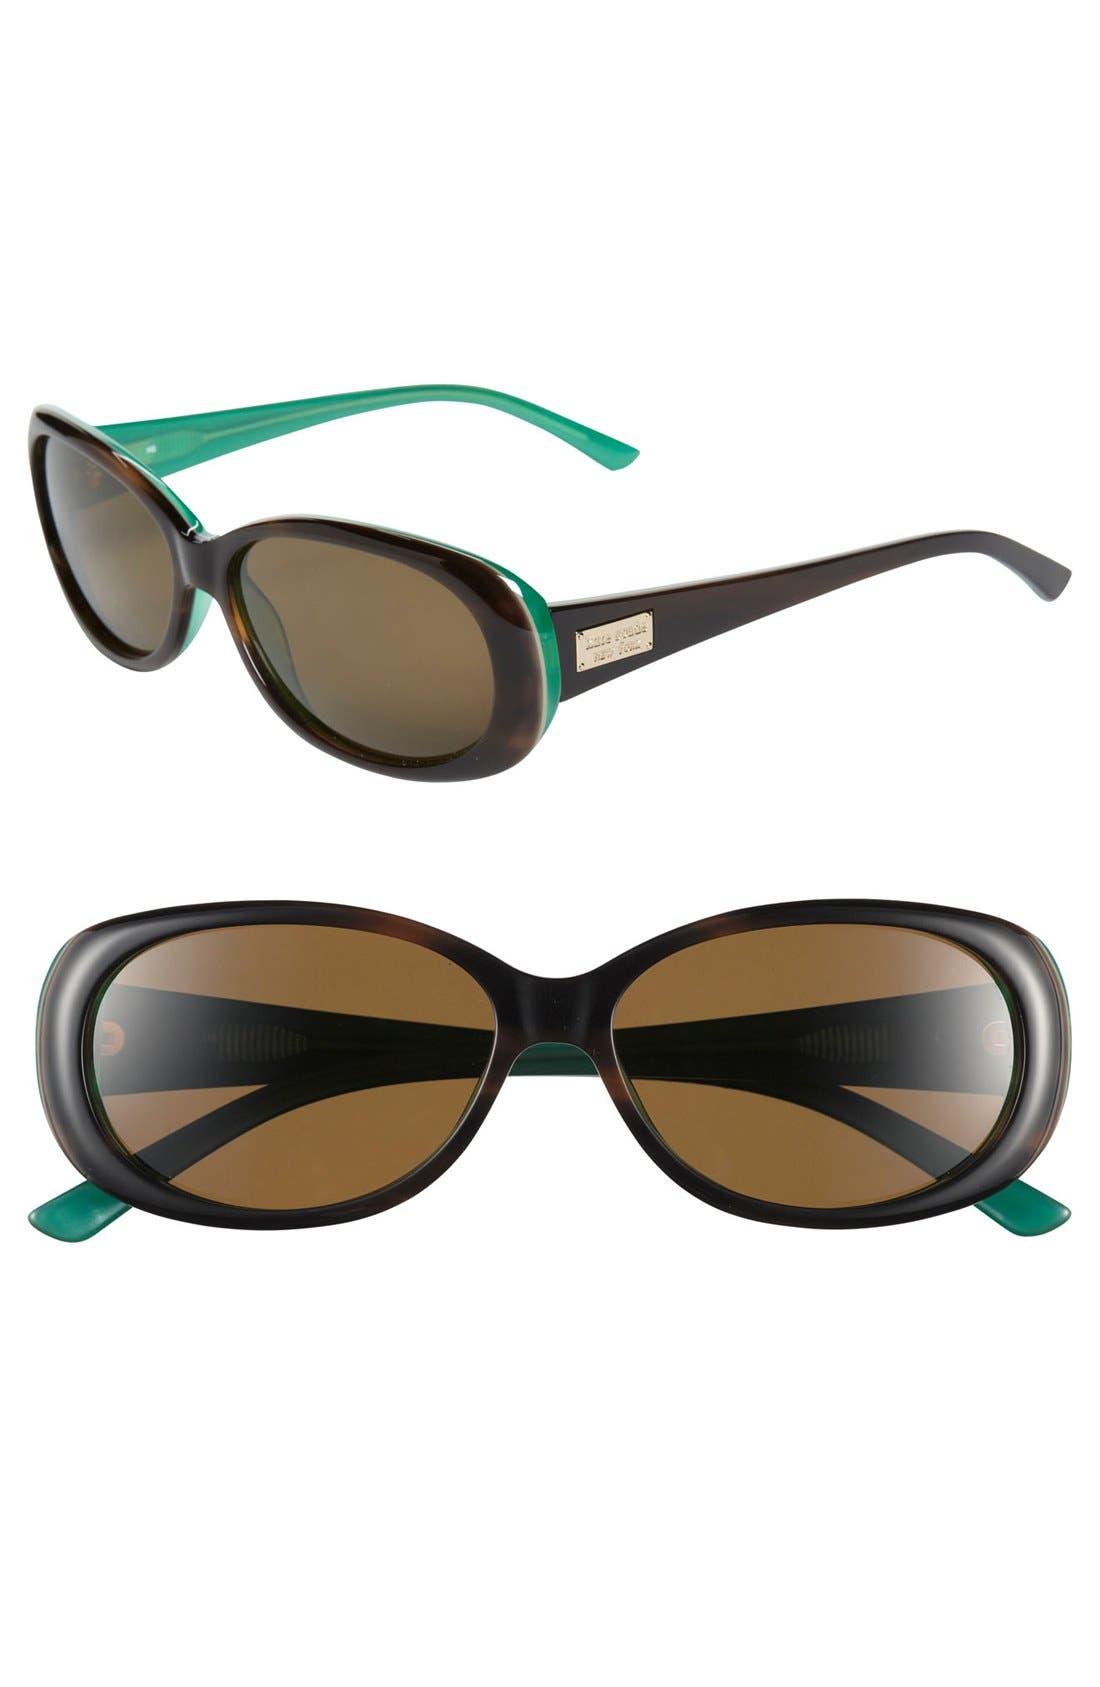 Alternate Image 1 Selected - kate spade new york 'sinclair' 55mm polarized sunglasses